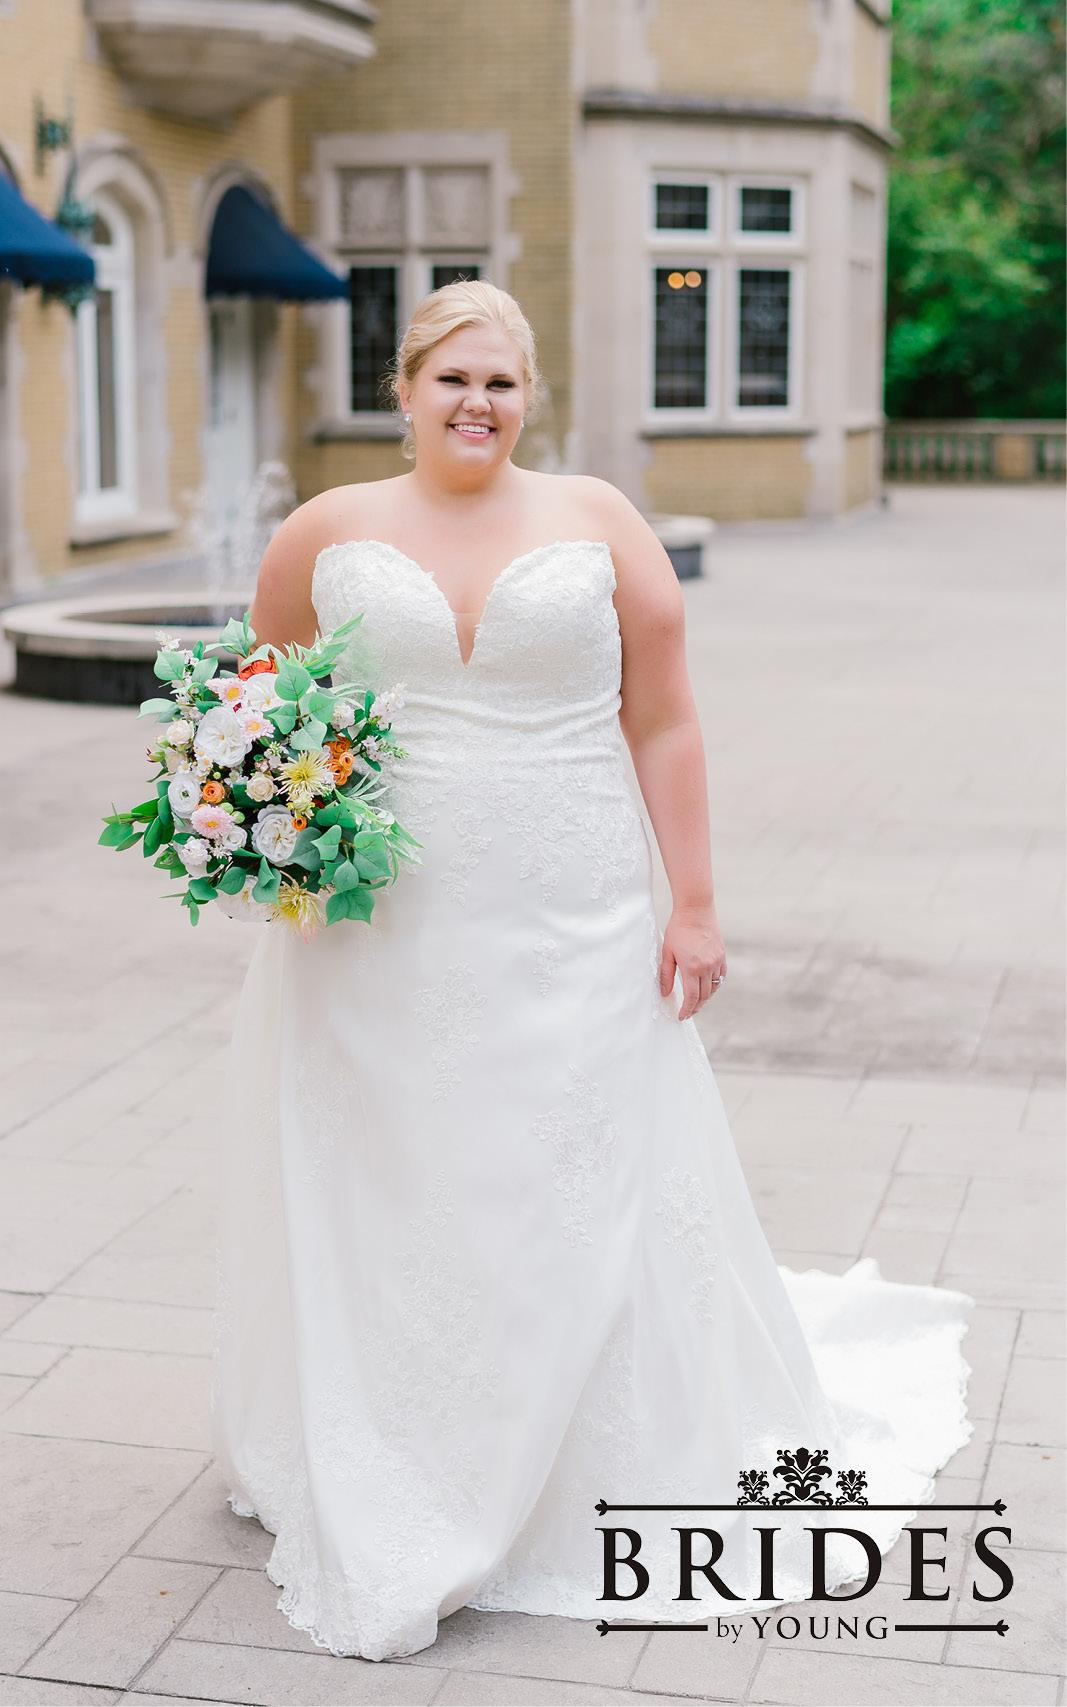 BridesbyYoung-2020Collection-PlusSizeBridalBoutique-CurvyWeddingDressInspiration-206.jpg